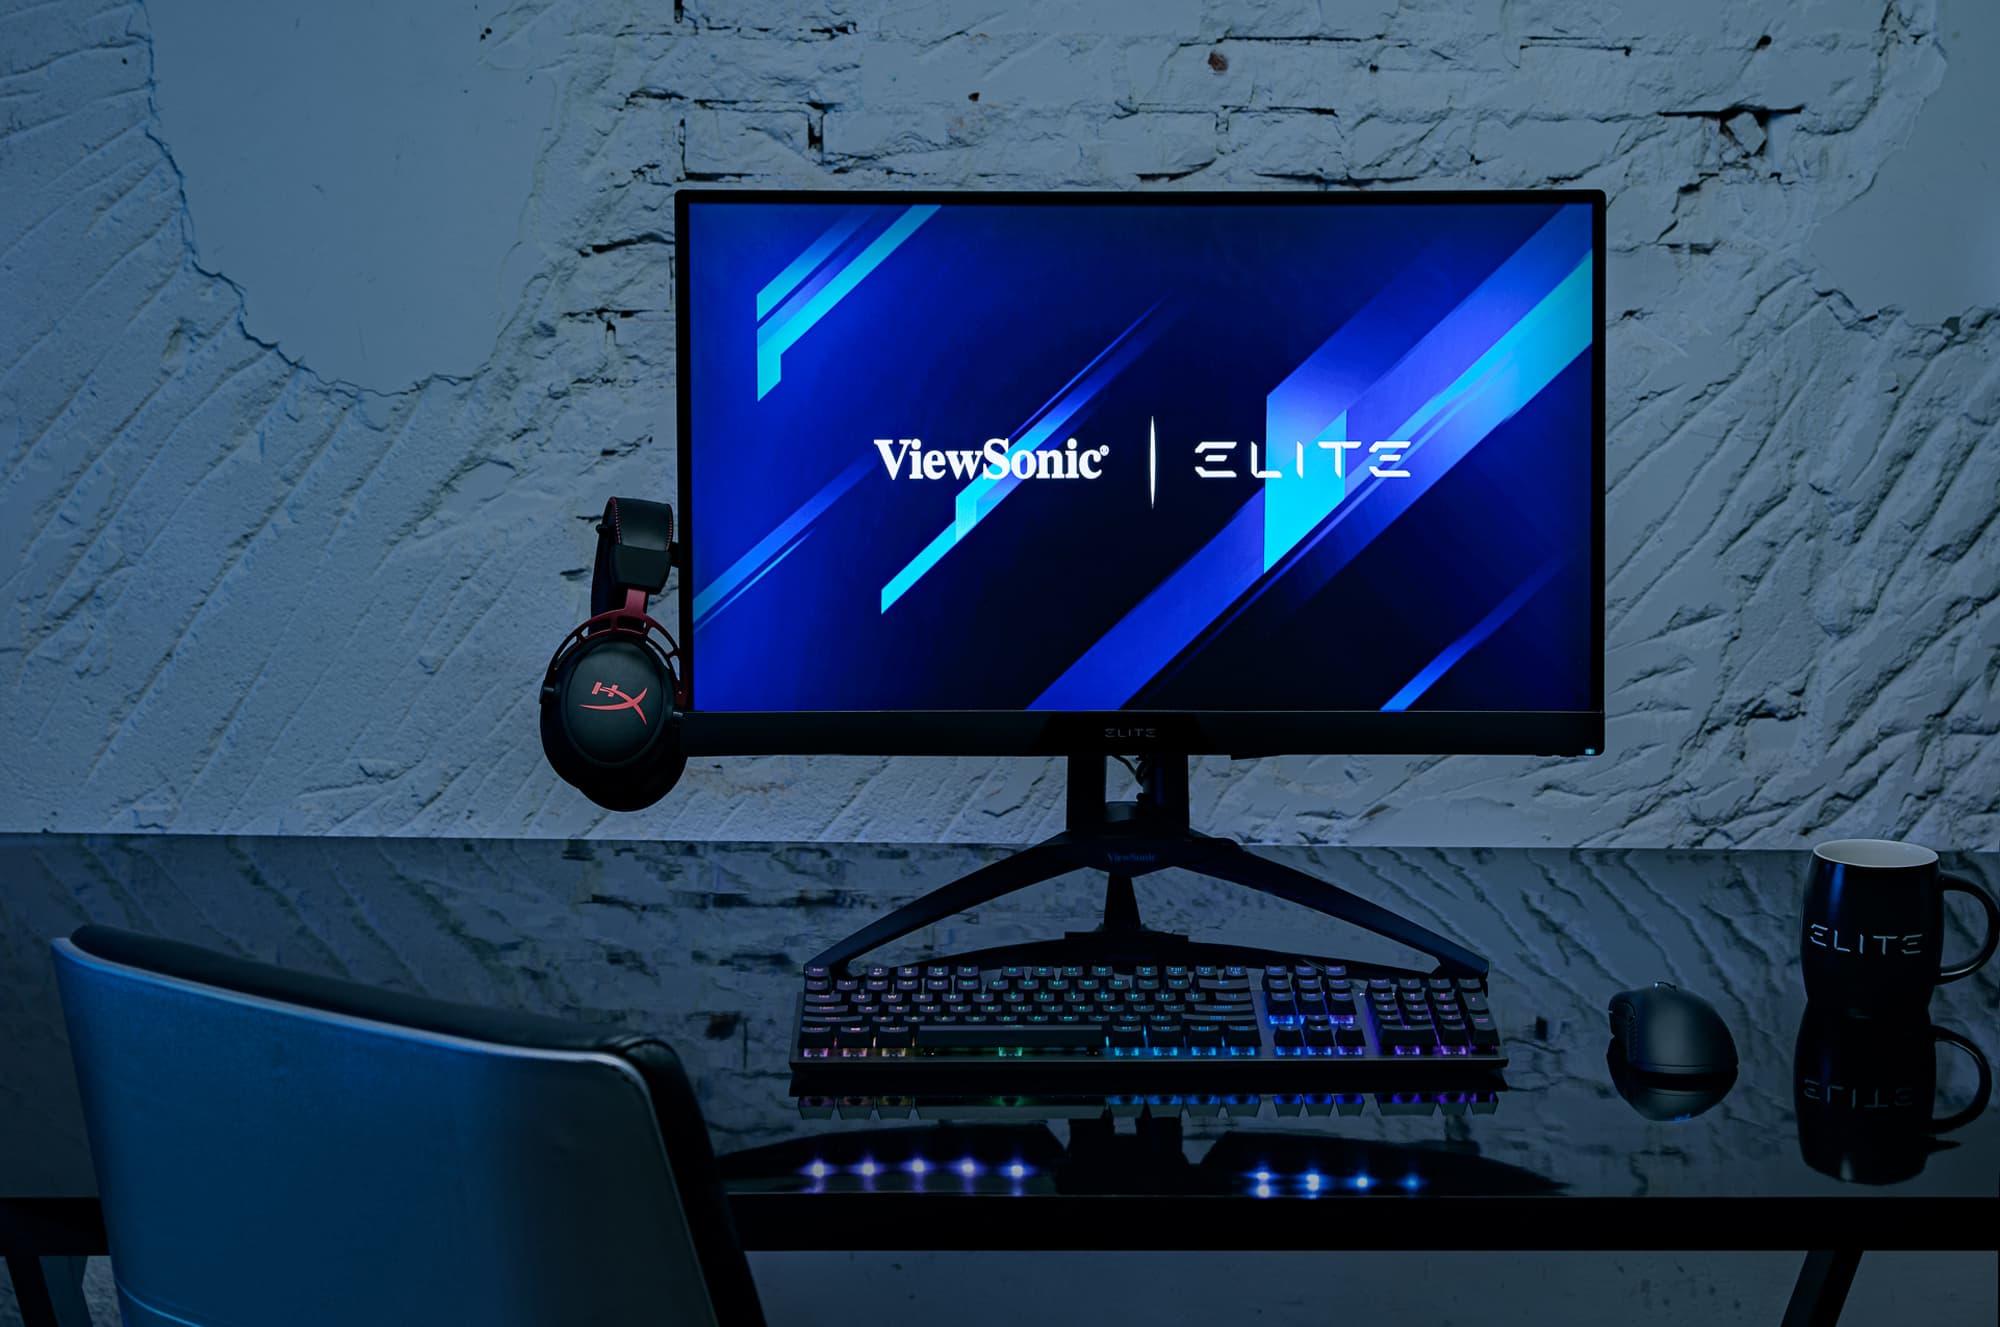 ViewSonic電競顯示器再添生力軍 全新27吋Elite™XG270QC 要讓玩家不傷荷包也能享受電玩新境界!